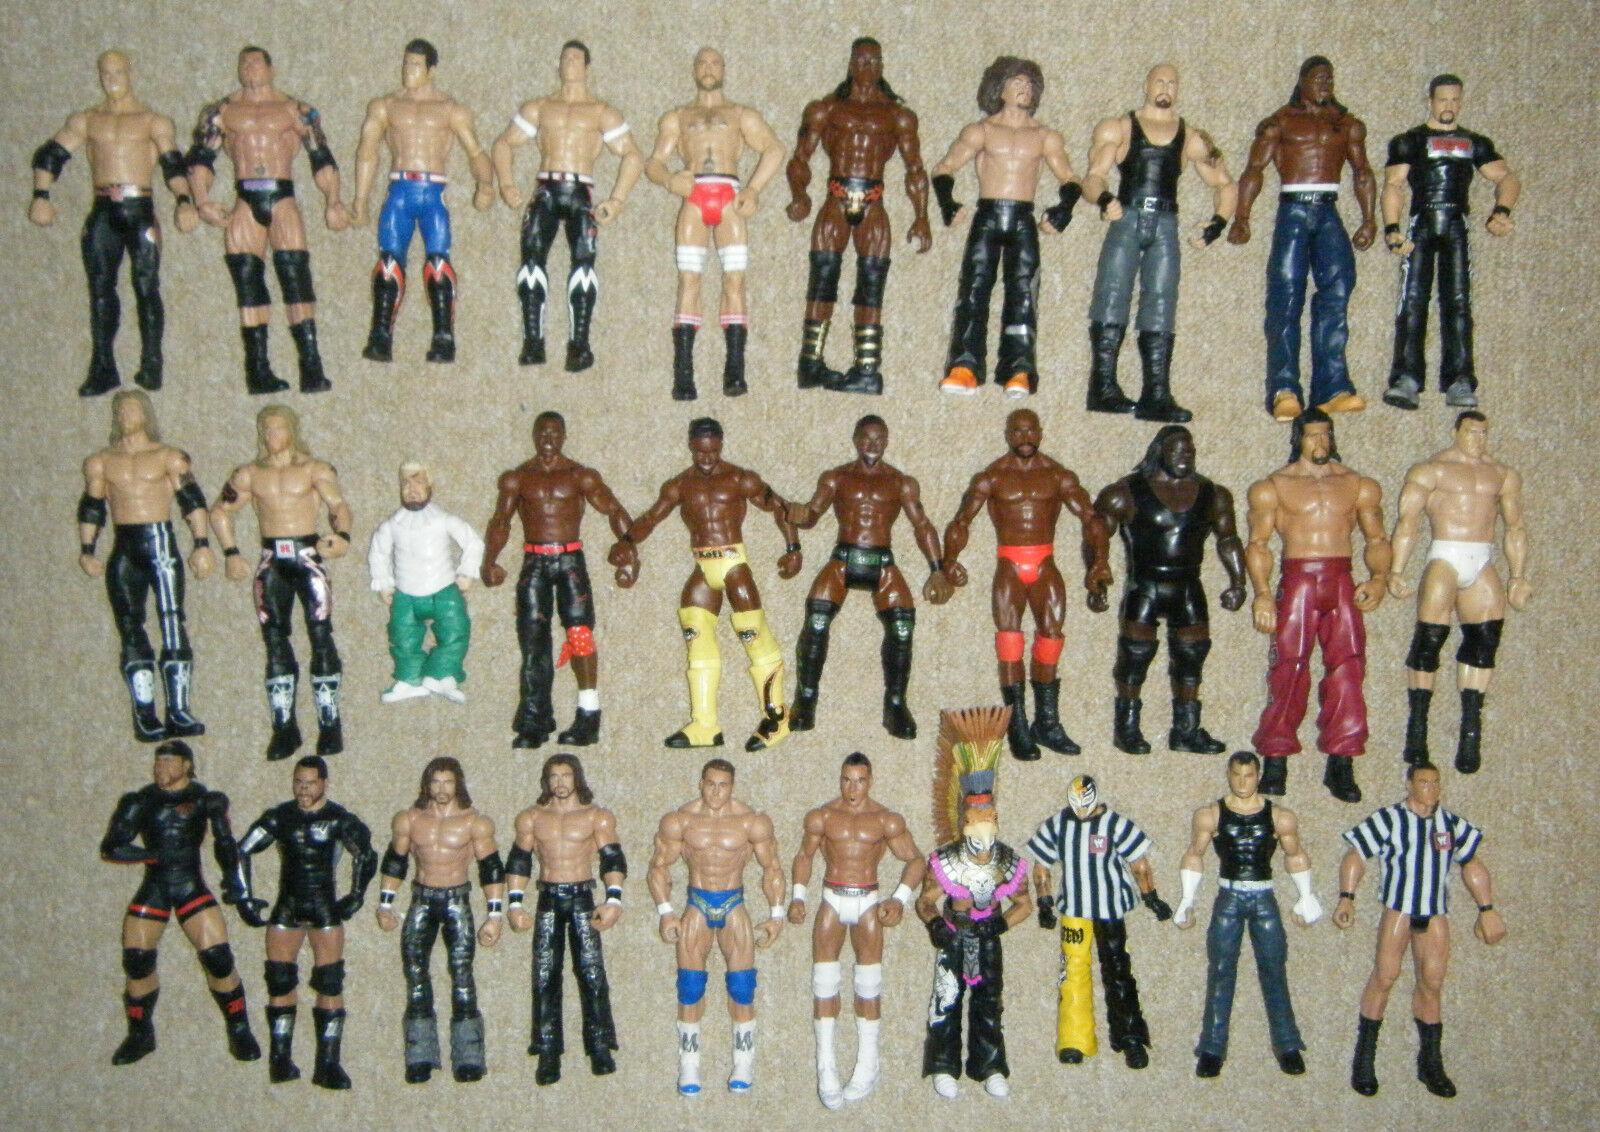 Wwe Wrestling Mattel Serie Básica Figura Acción Luchadores Entrada Juguetes